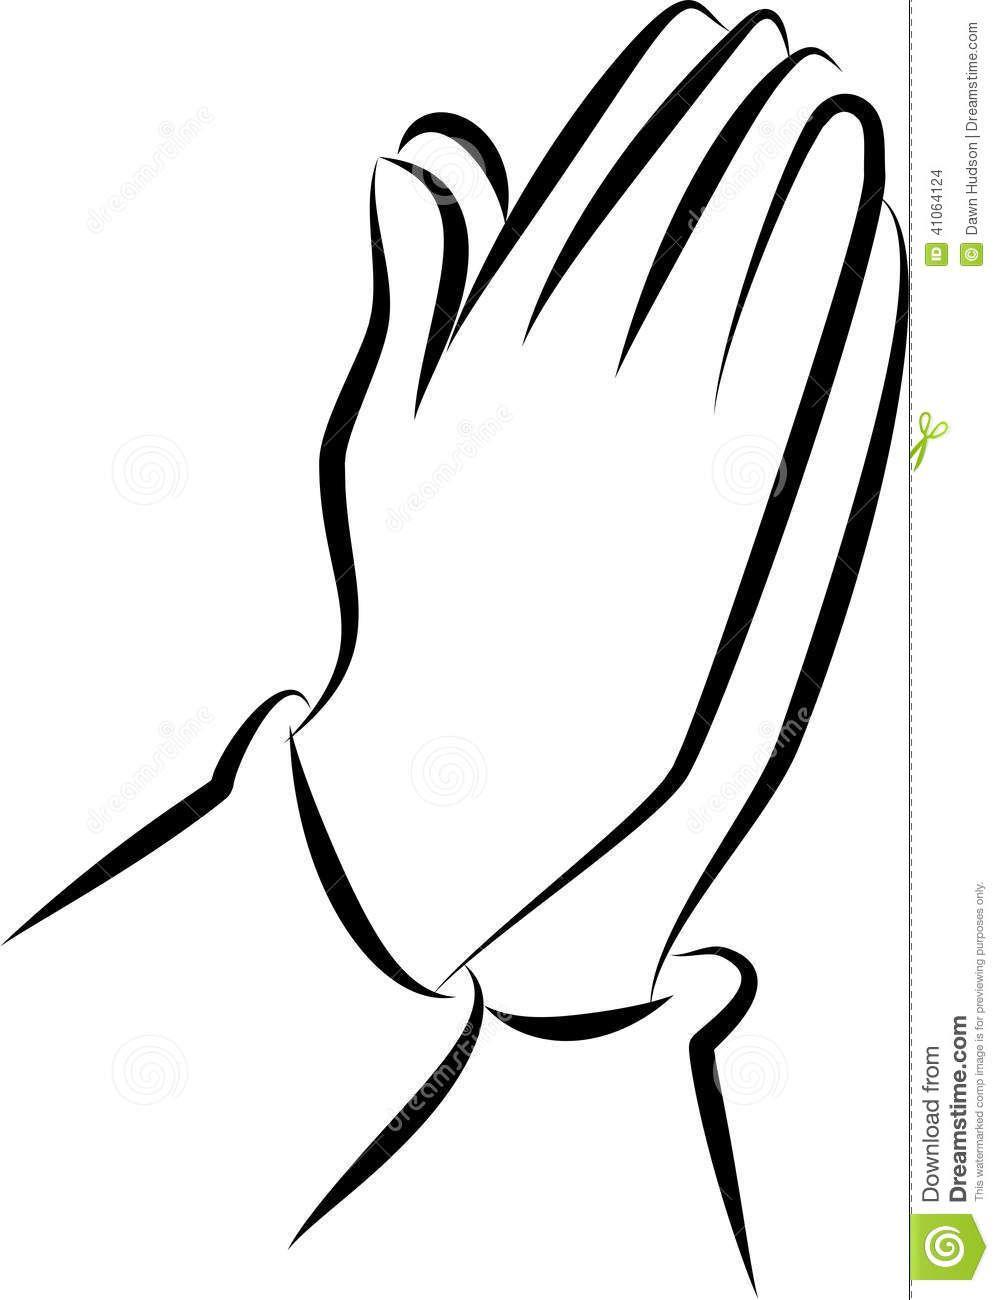 White Praying Hands Black Background